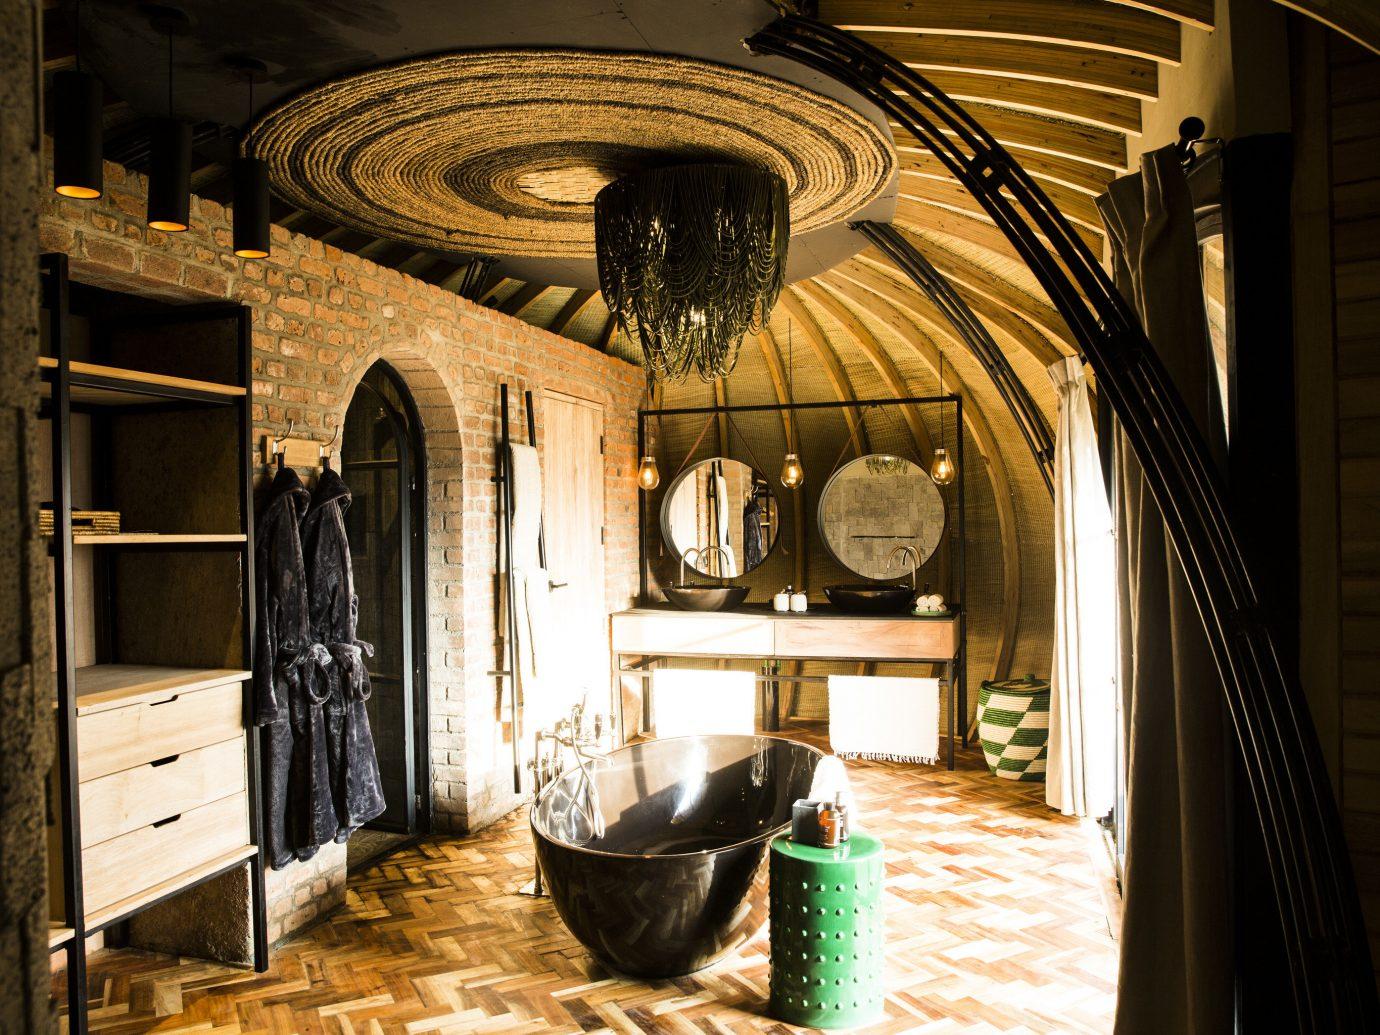 Honeymoon Hotels Luxury Travel Romance indoor room interior design ceiling home estate Lobby window furniture